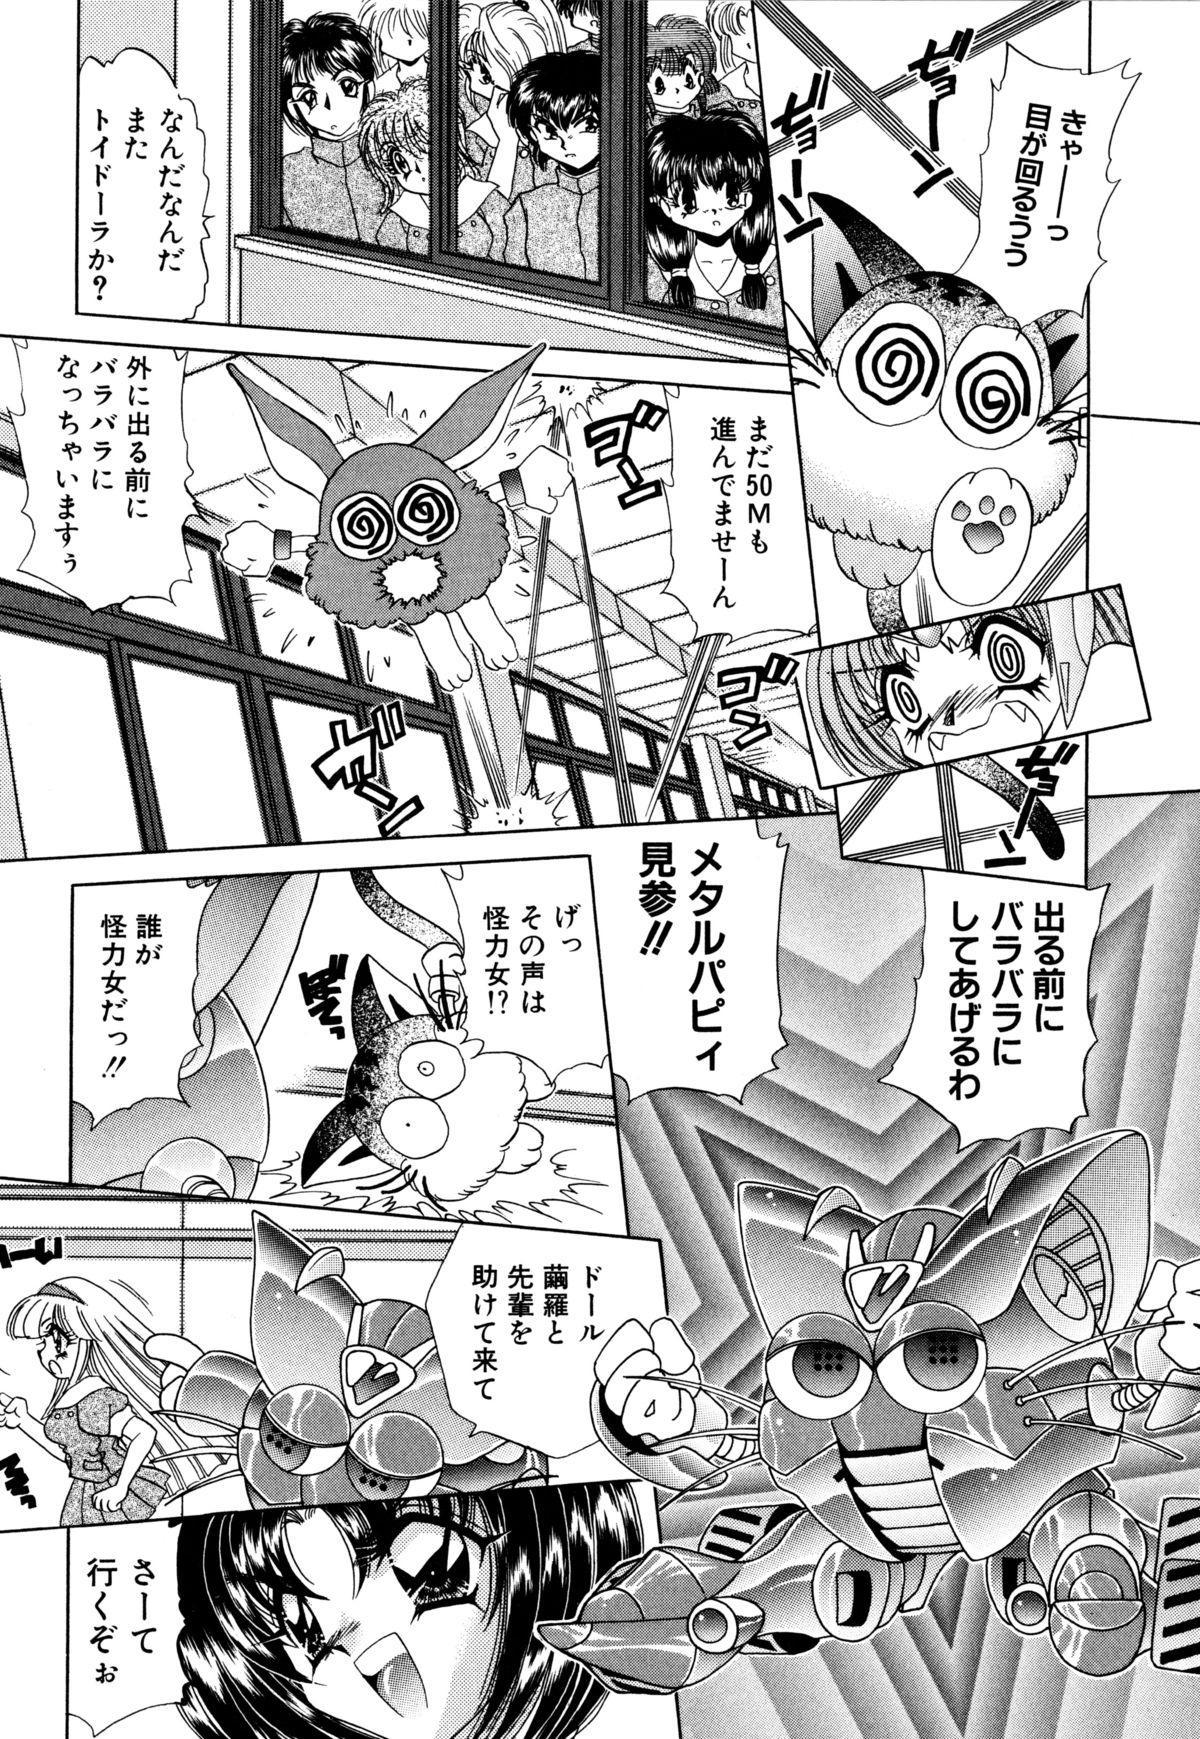 Kigurumi Sentai Quiltian 195